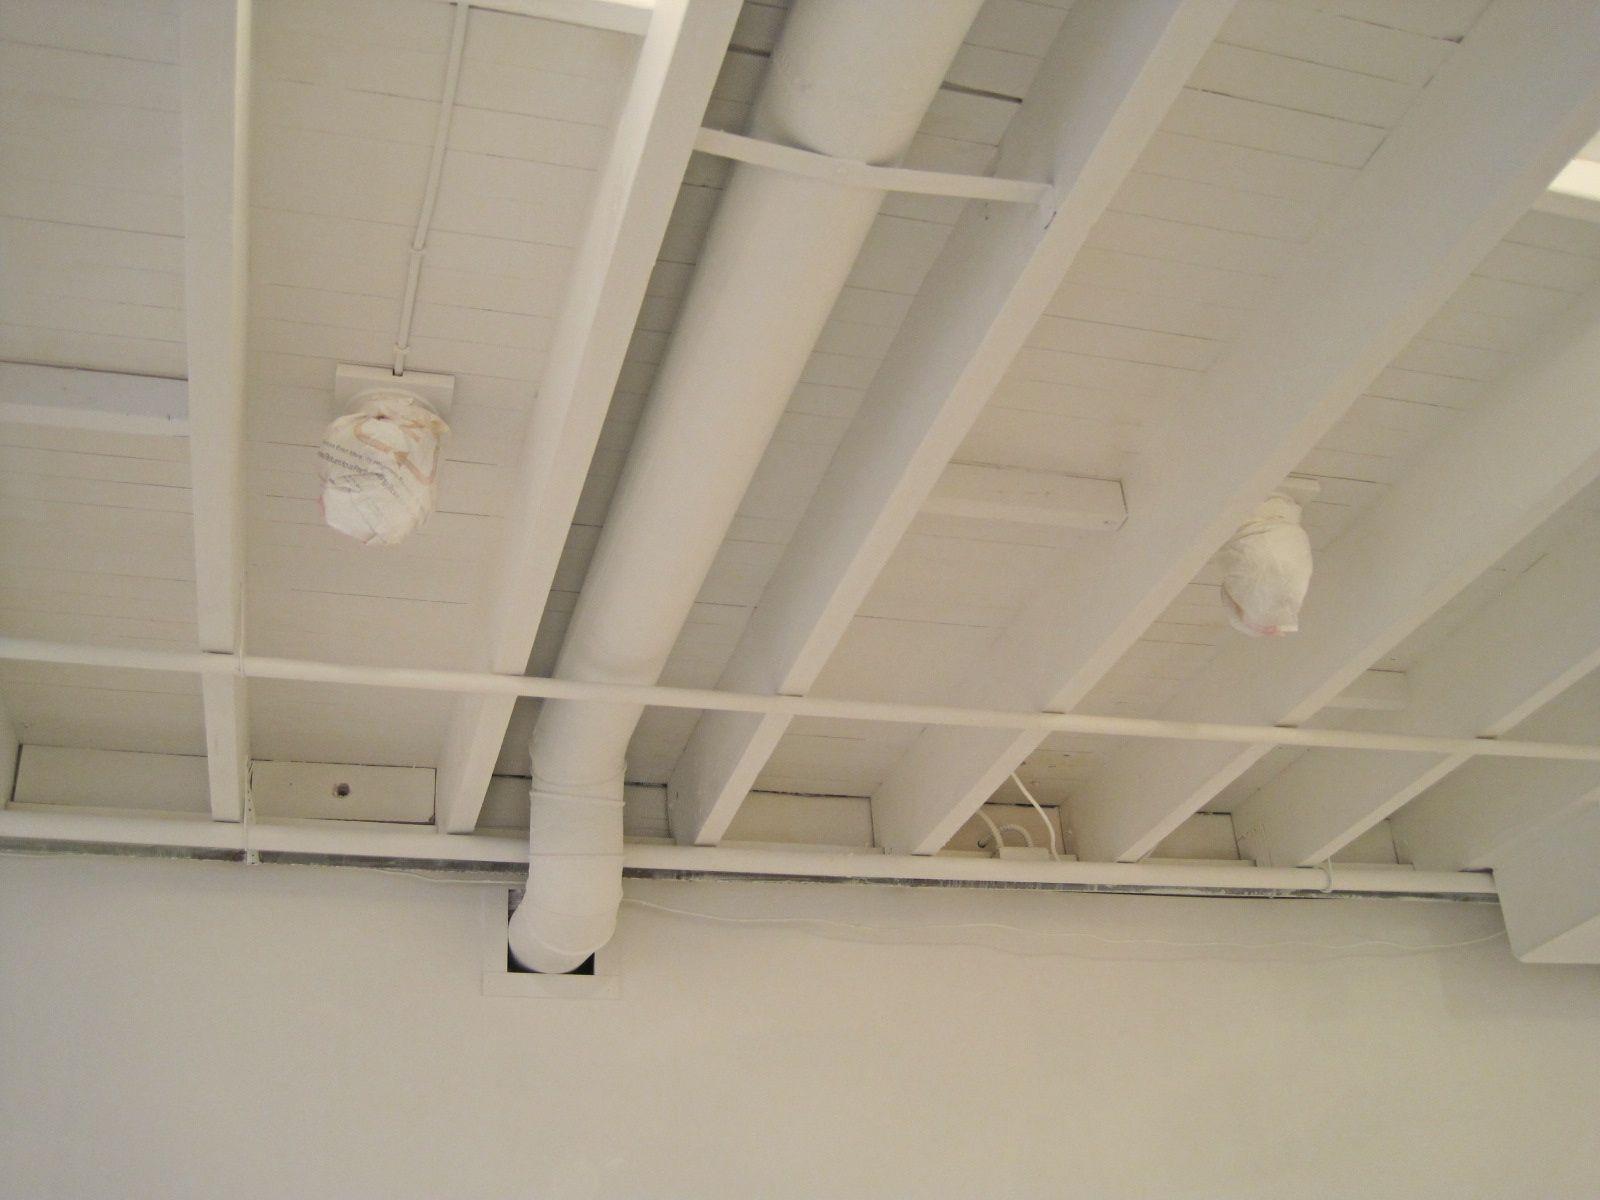 Spray Paint Basement Ceiling Ideas   Basements, Painted ...